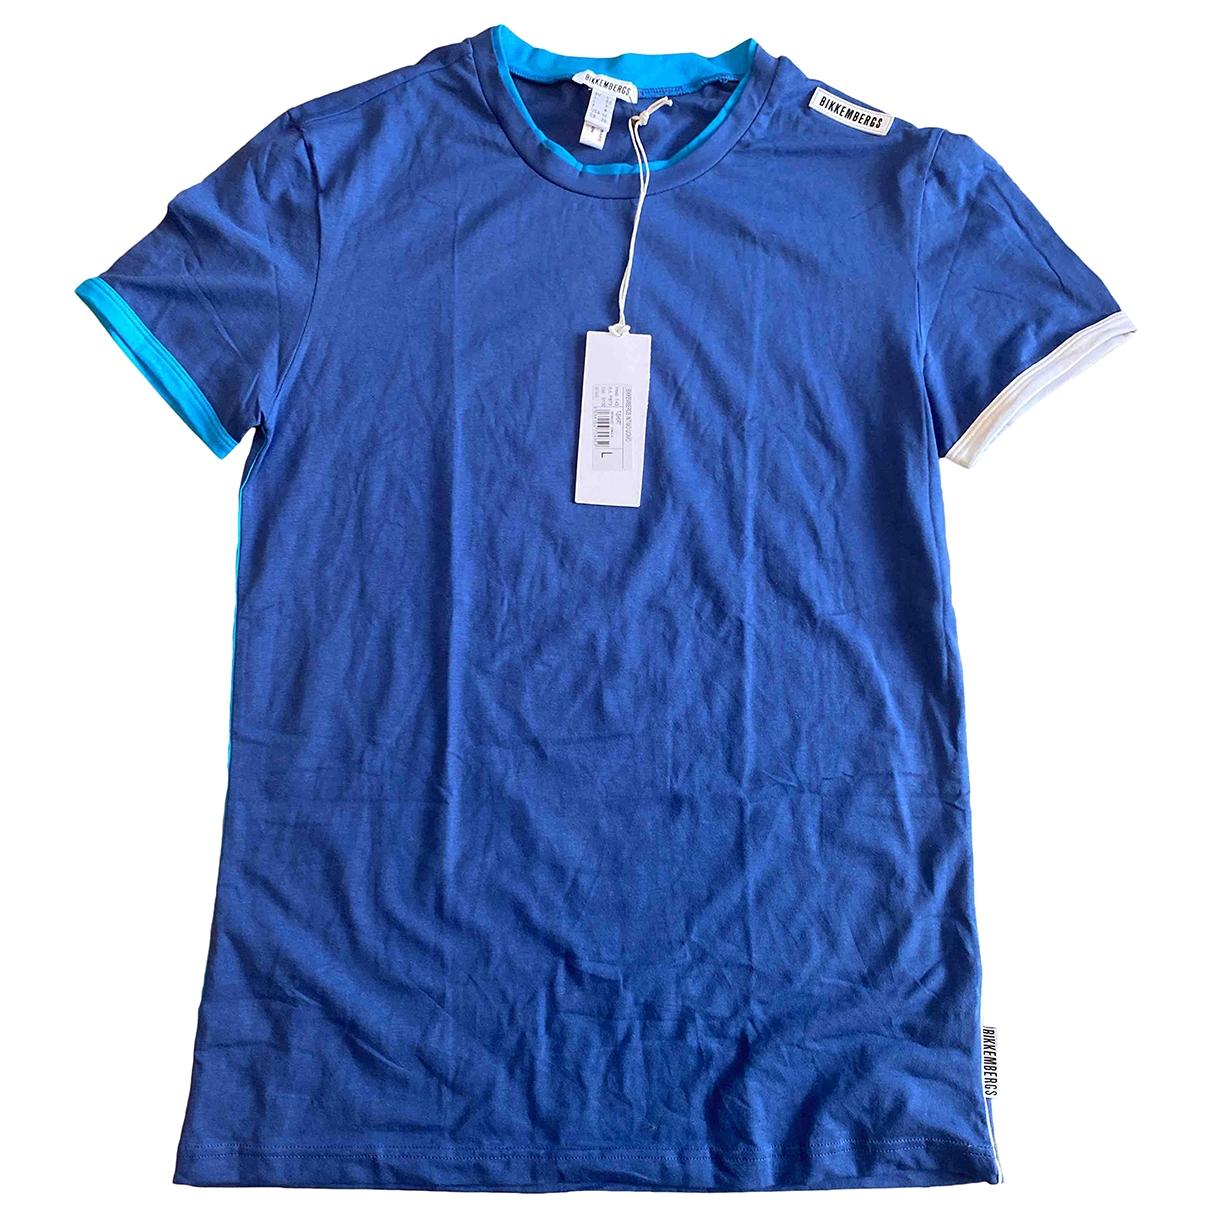 Dirk Bikkembergs \N Blue Cotton T-shirts for Men L International